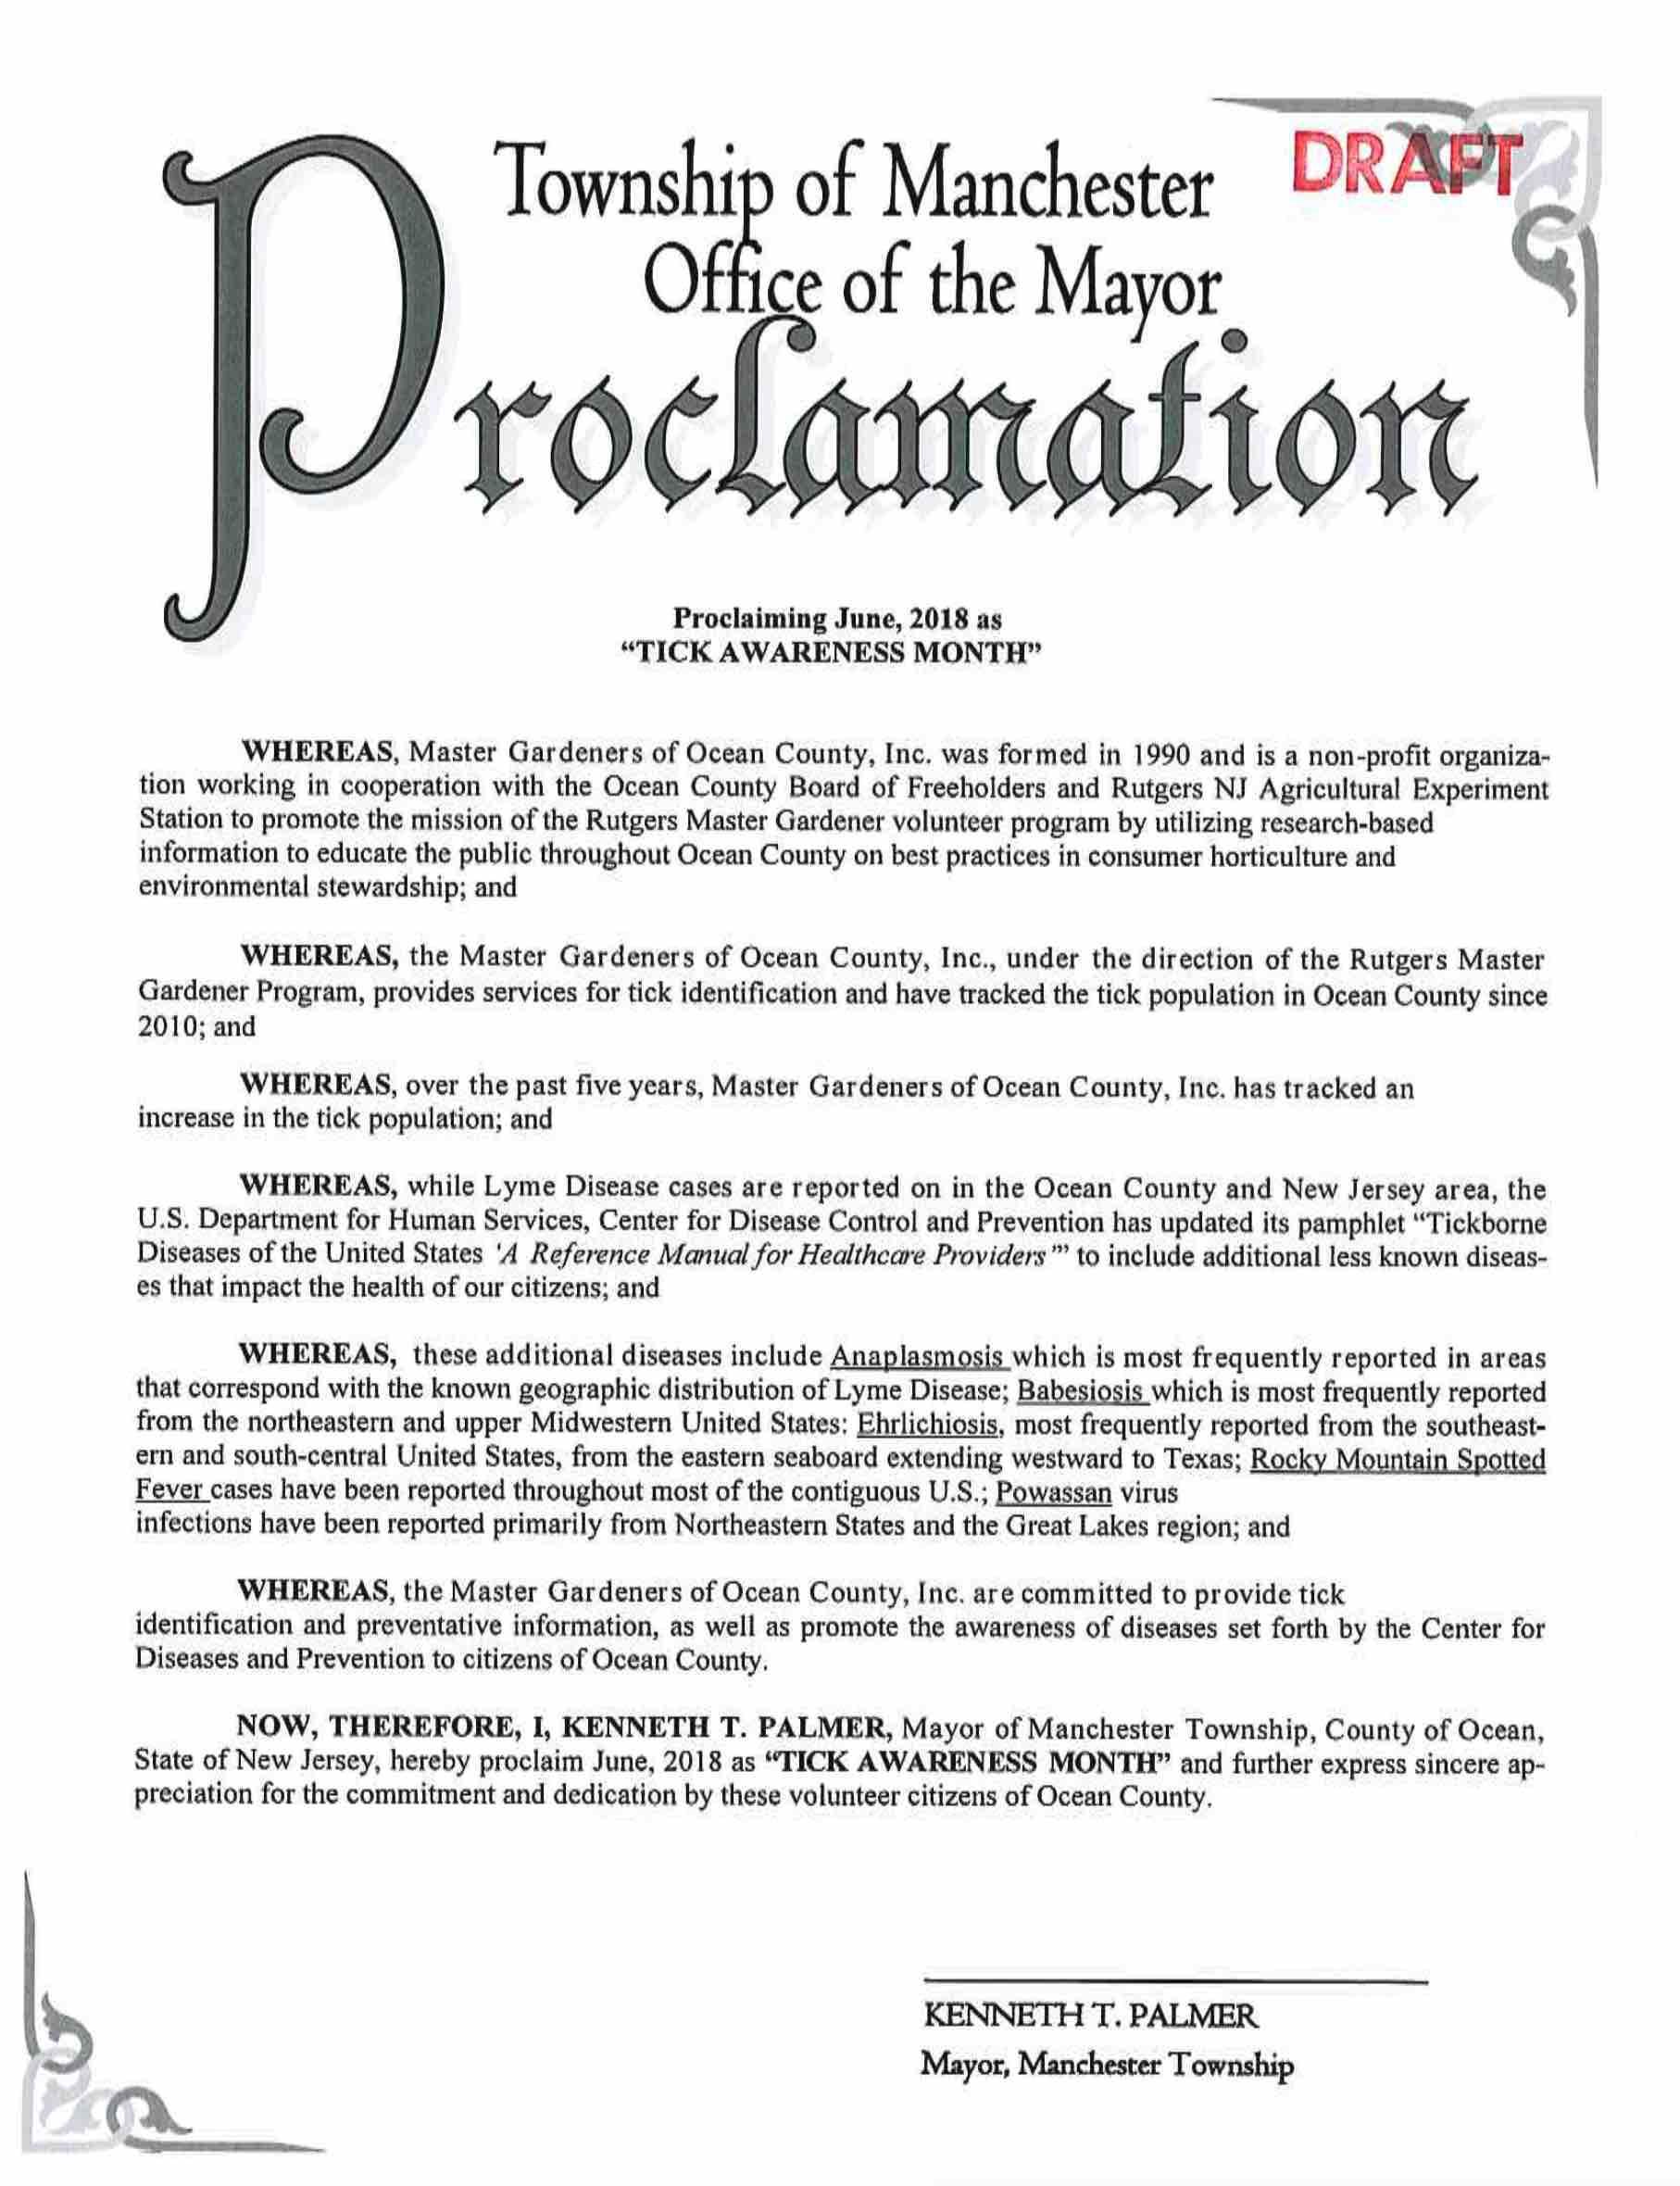 NJ Manchester Cnty Lyme Proclamation 2018b